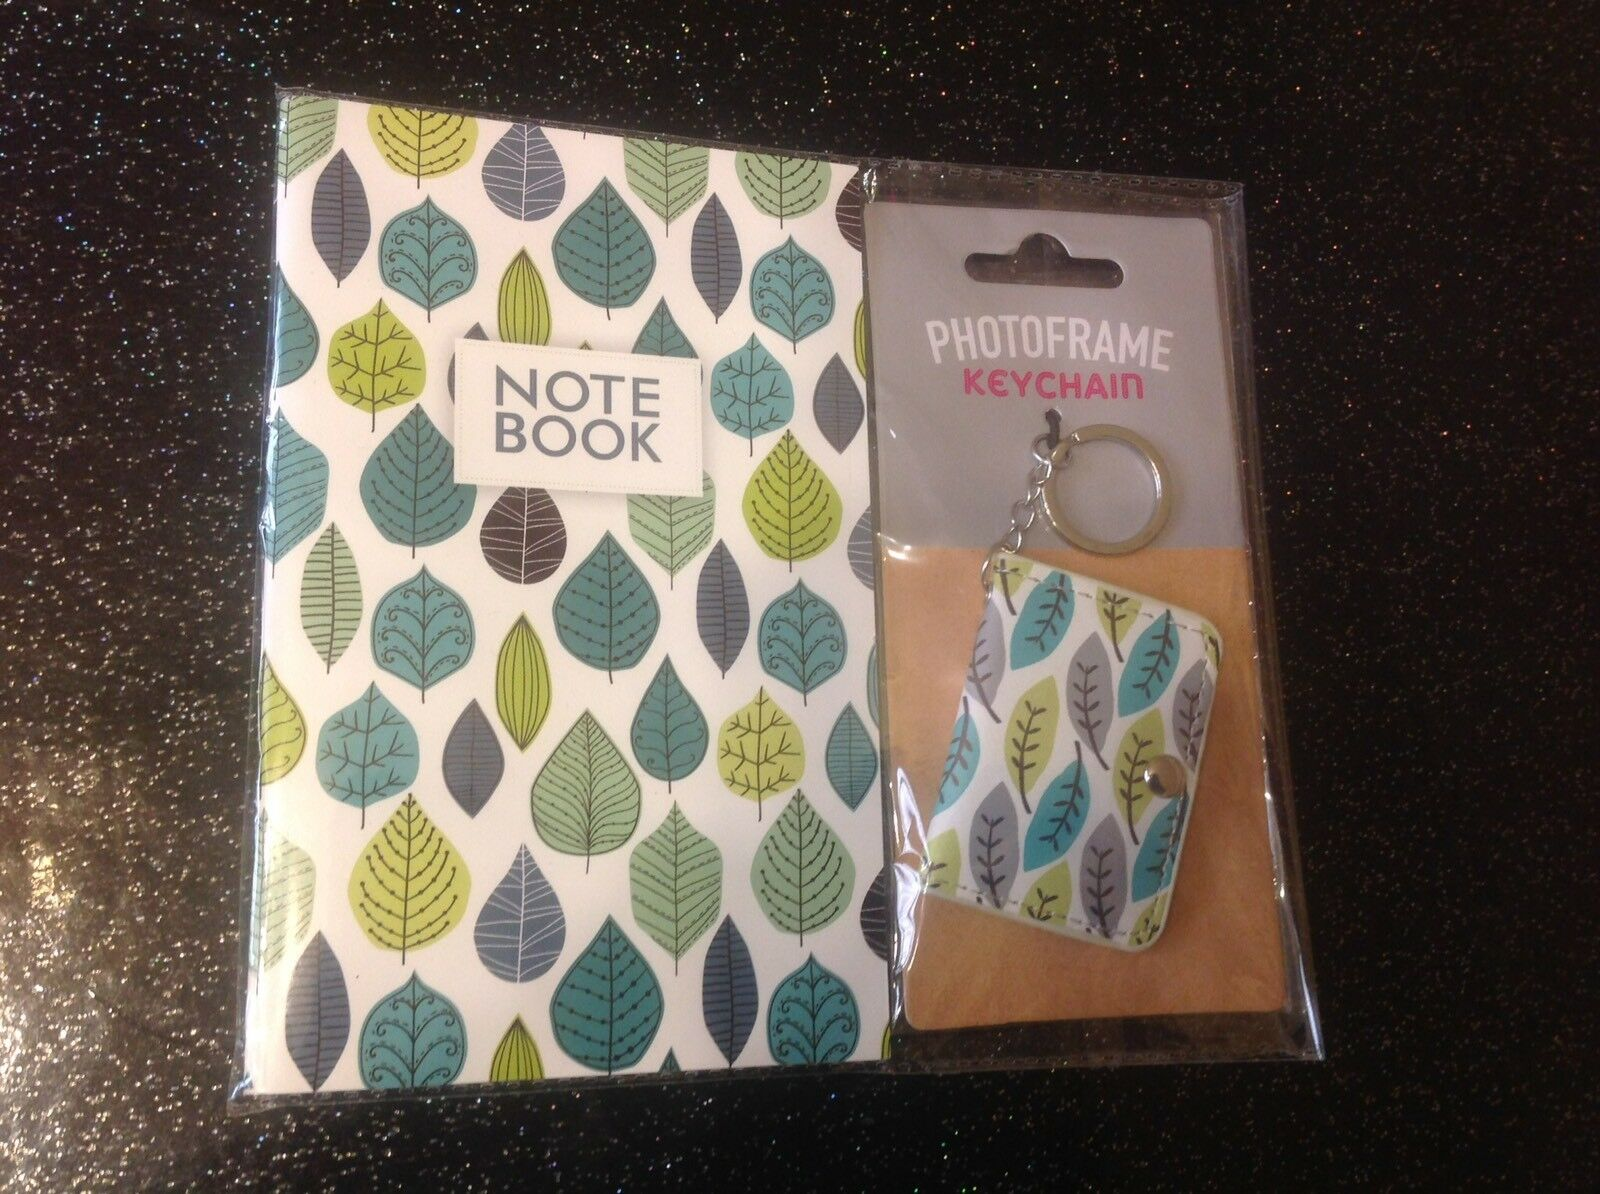 Retro Rockabilly 50's Atomic Leaf Notebook +Photo Frame Keyring 2 Piece Gift Set